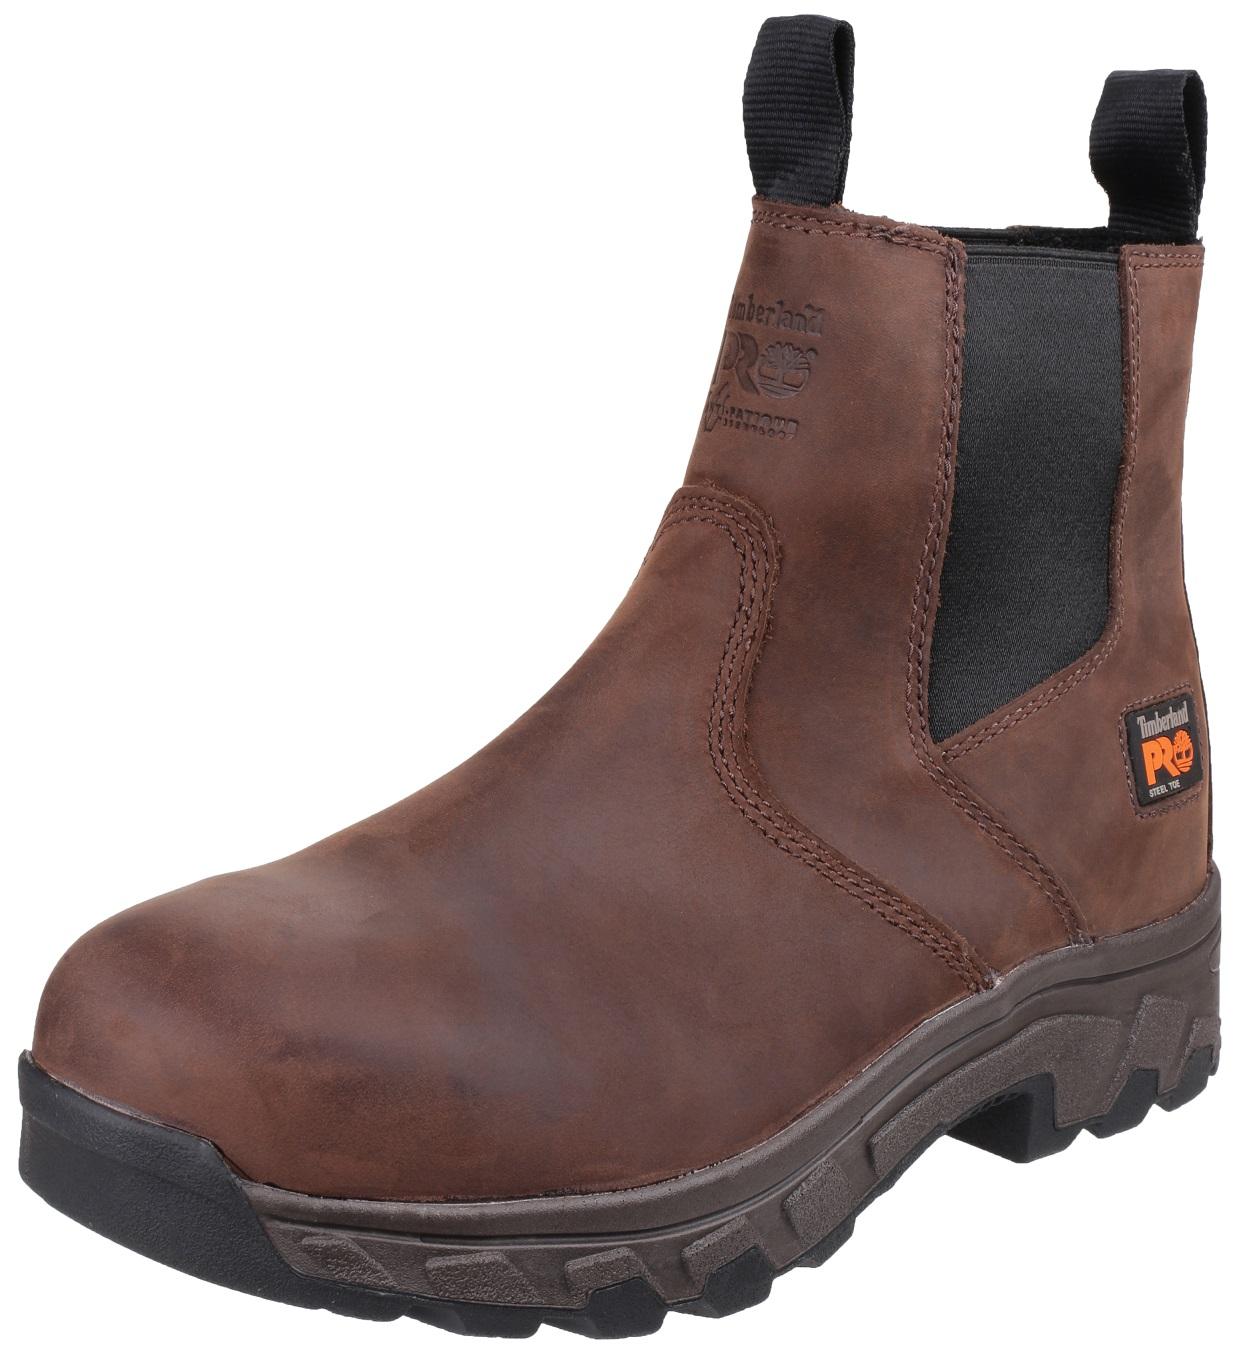 Timberland Pro Workstead Forhandler Støvler Stål Tå Caps Og Mellomsåle tBR8XLNq